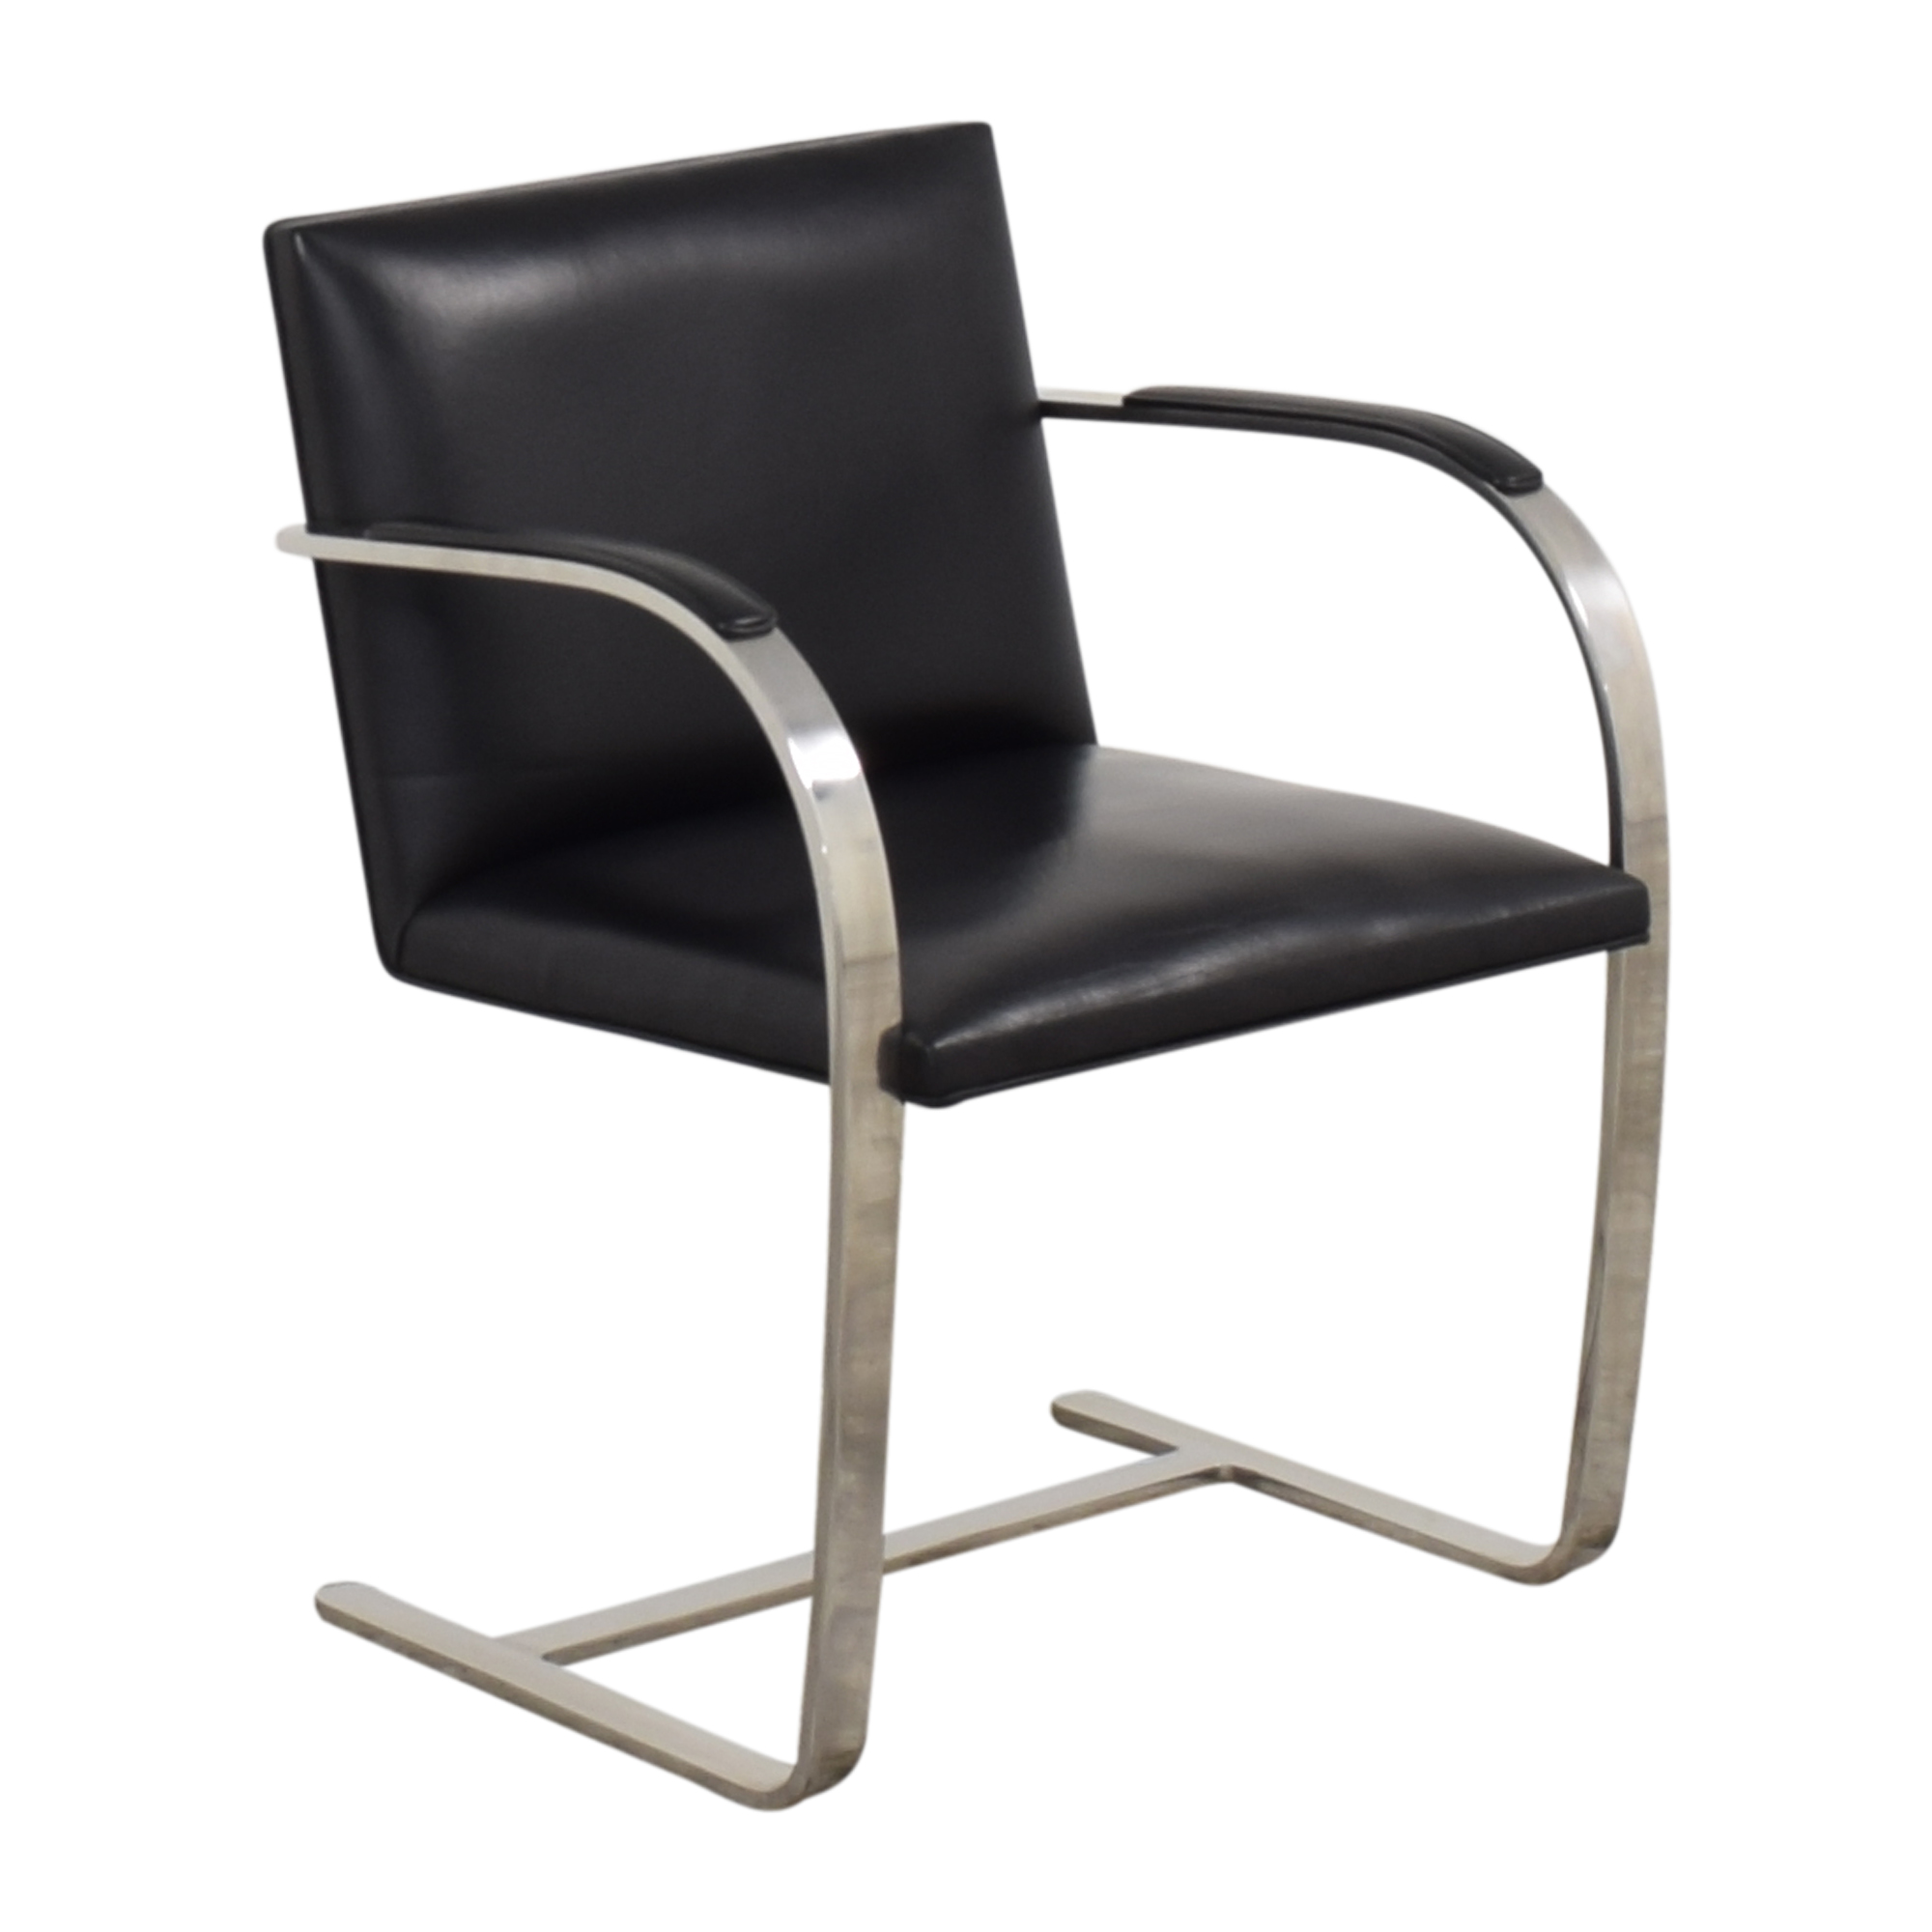 Knoll Mies Van Der Rohe for Knoll Brno Flat Bar Chair Chairs